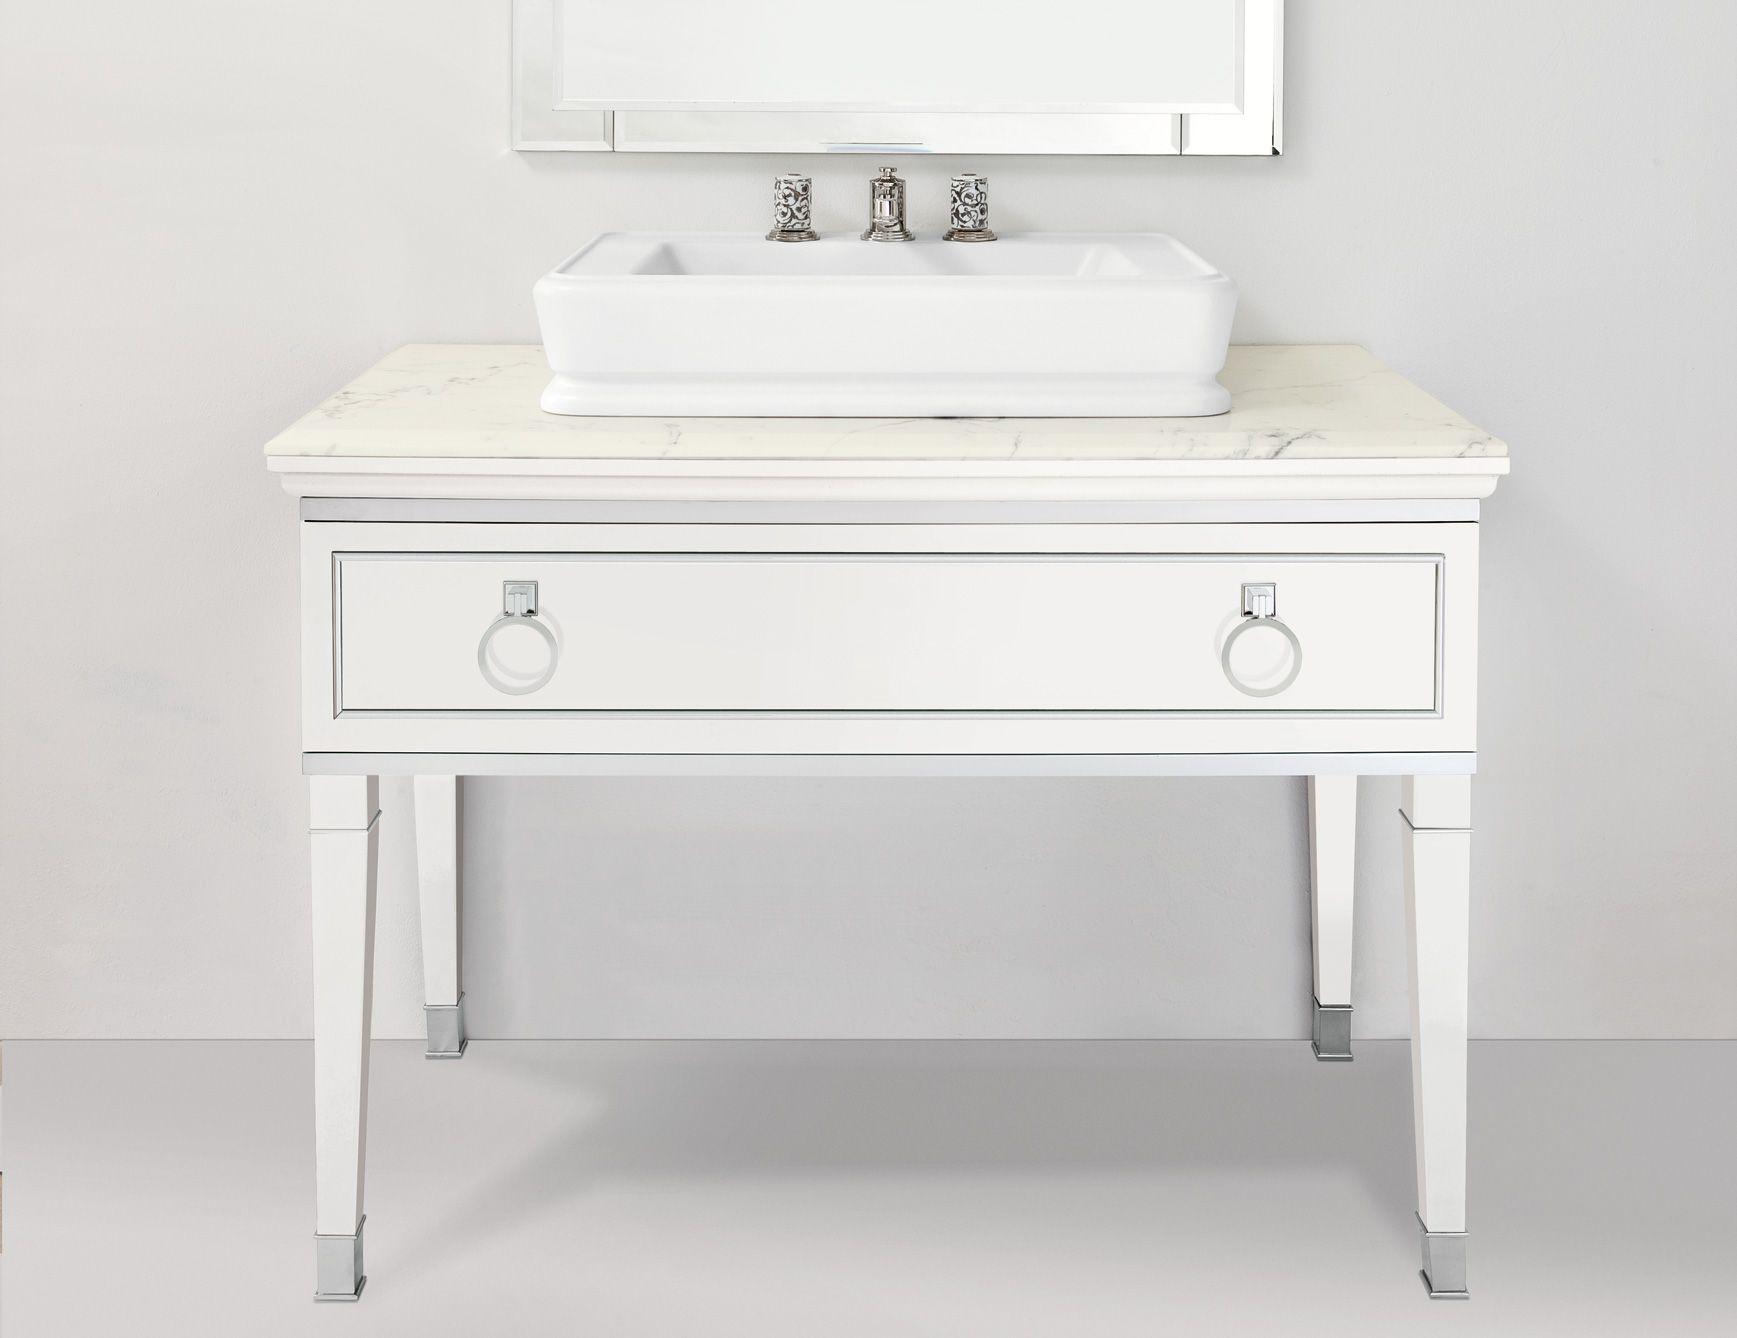 Bathroom Vanities Lutetia Luxury Bathroom Vanities Bathroom Vanity Italian Bathroom